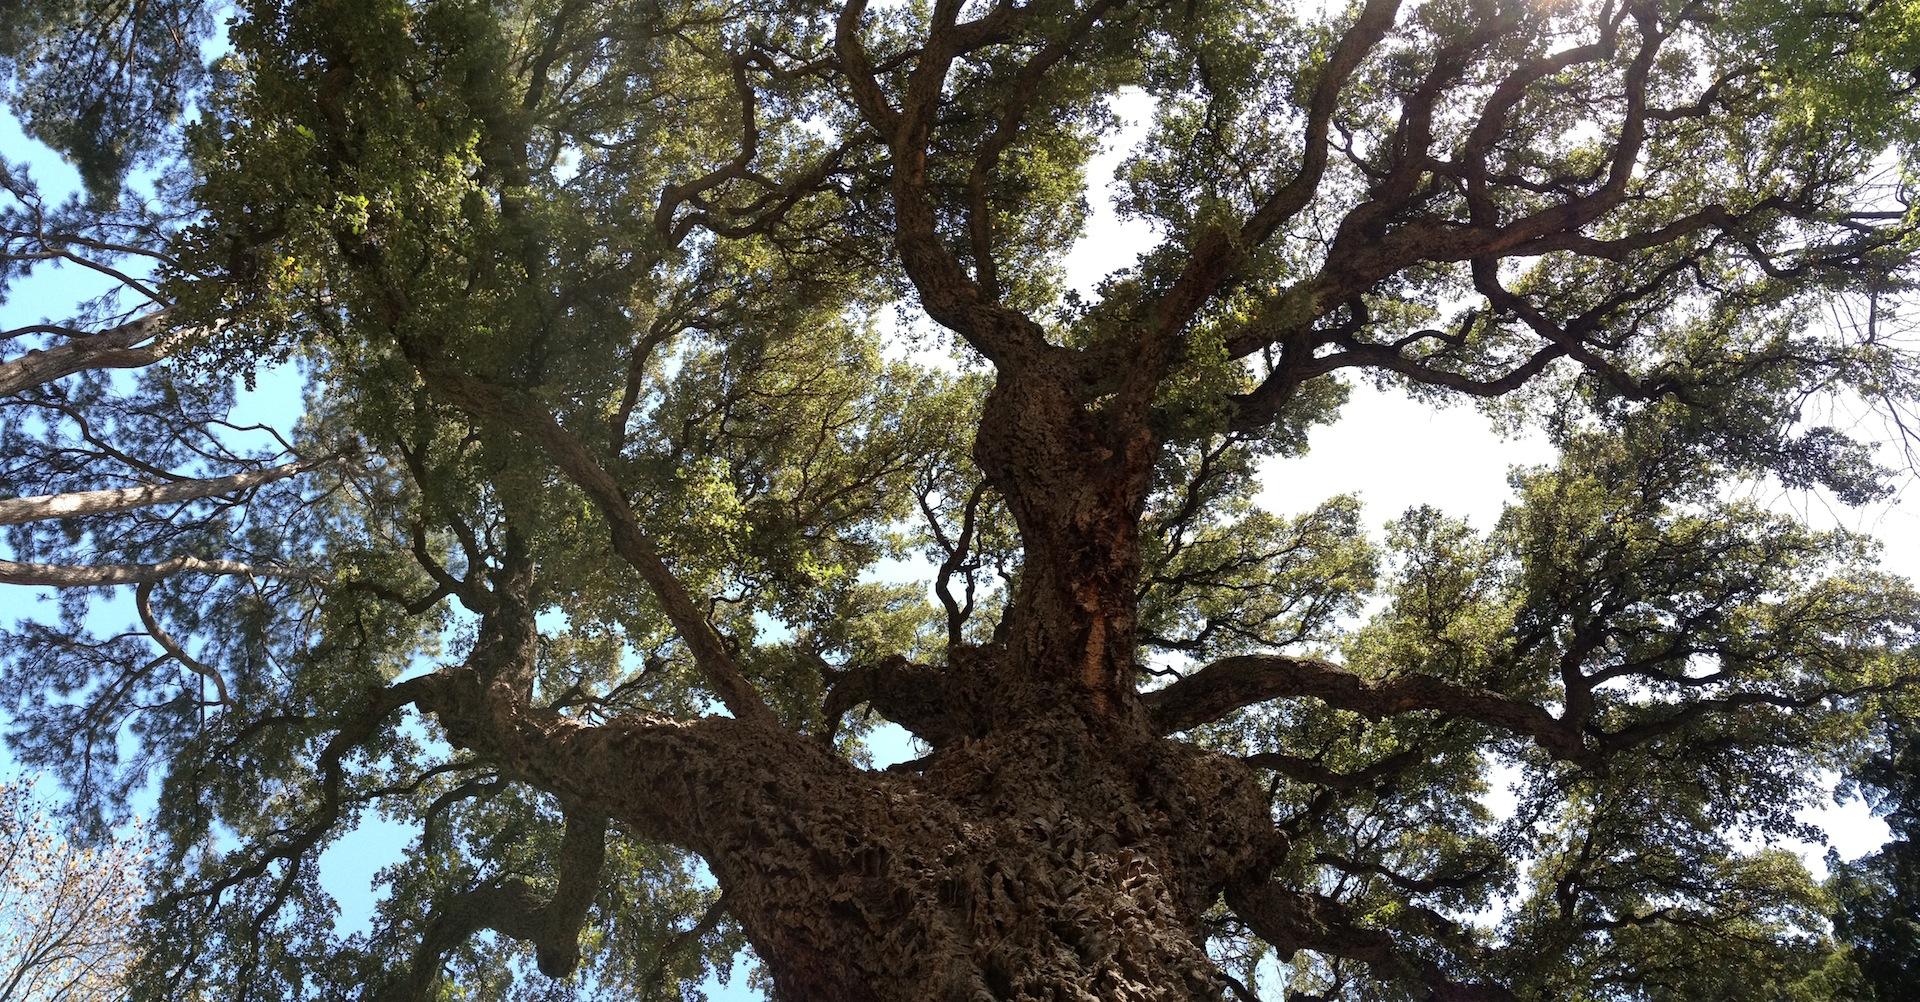 Magnificent Cork Oak in Botanical Gardens Florence